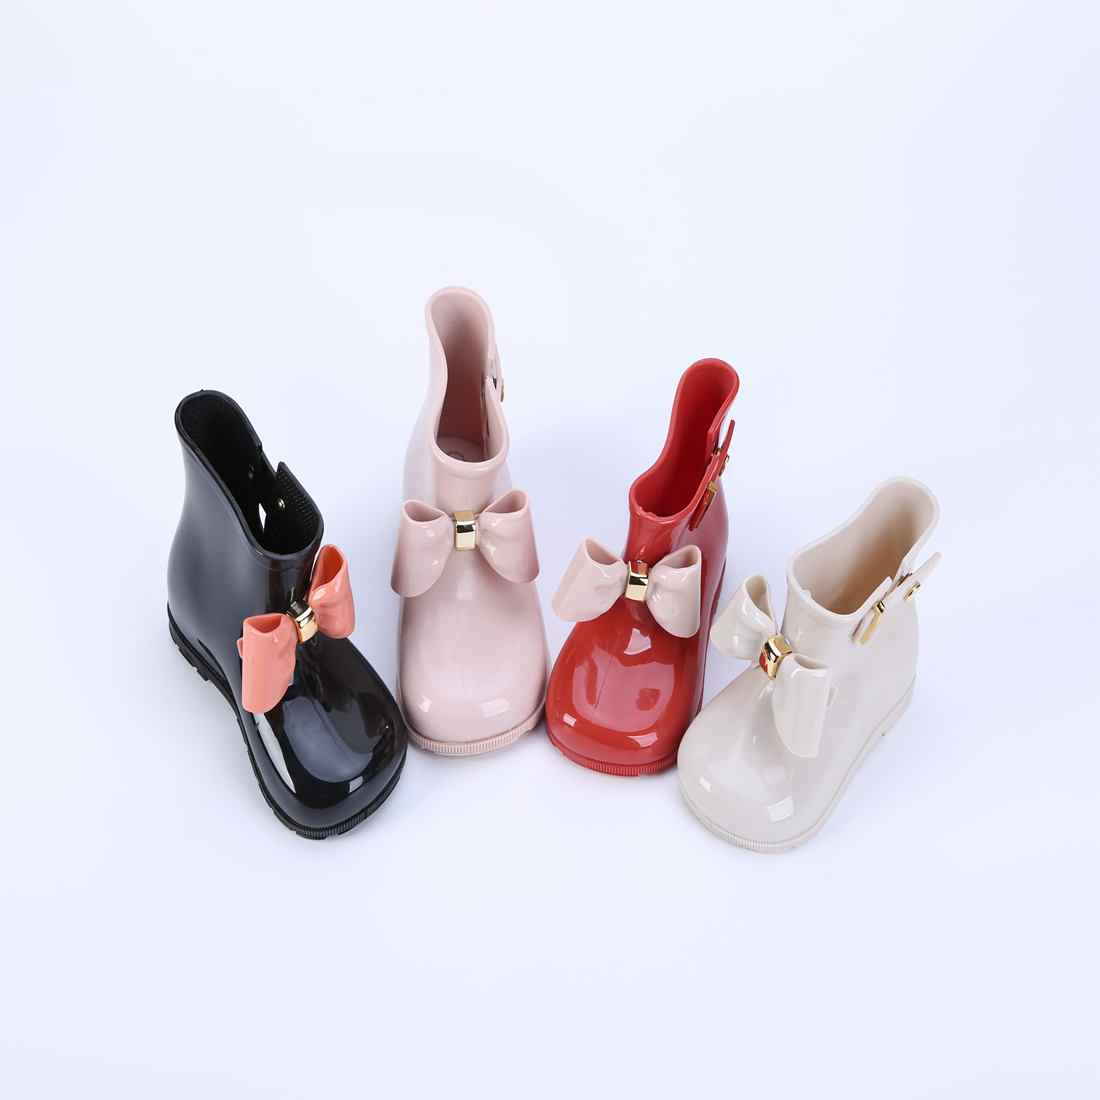 c5856e04cd69 Melissa Rain Boots PVC Bow Boot Bowknot Children Shoes 2018 New Winter Side  Rivets Mini Kids